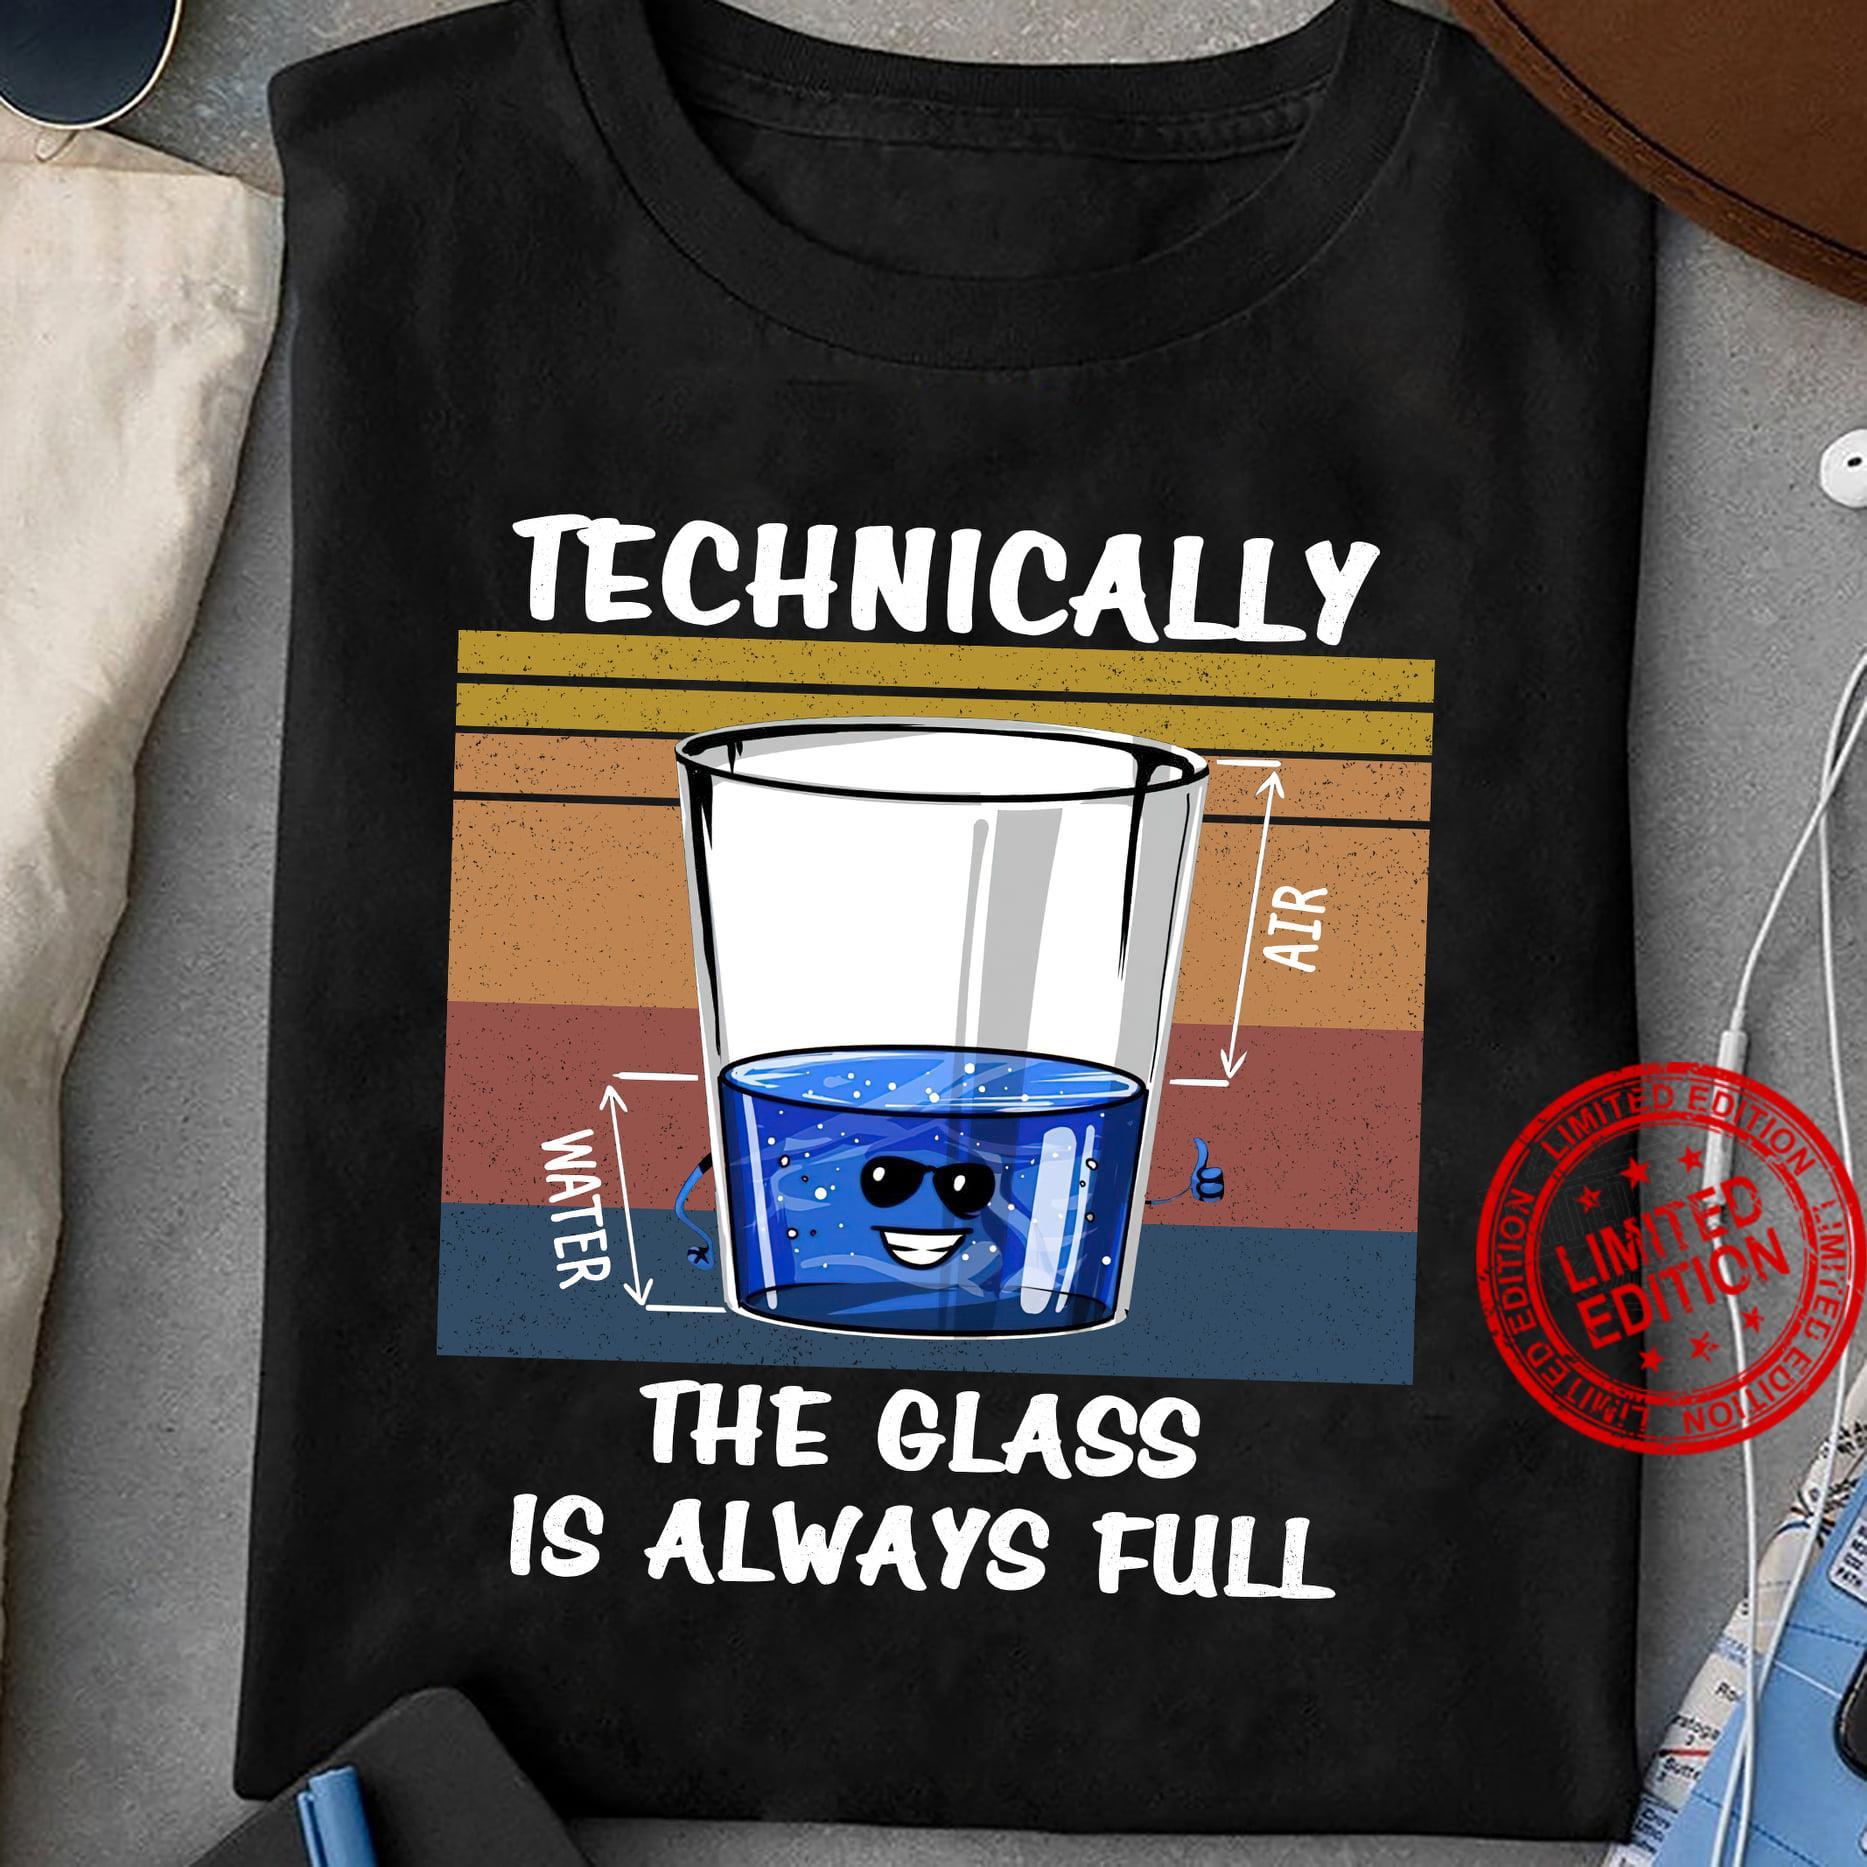 Technically The Glass Shirt